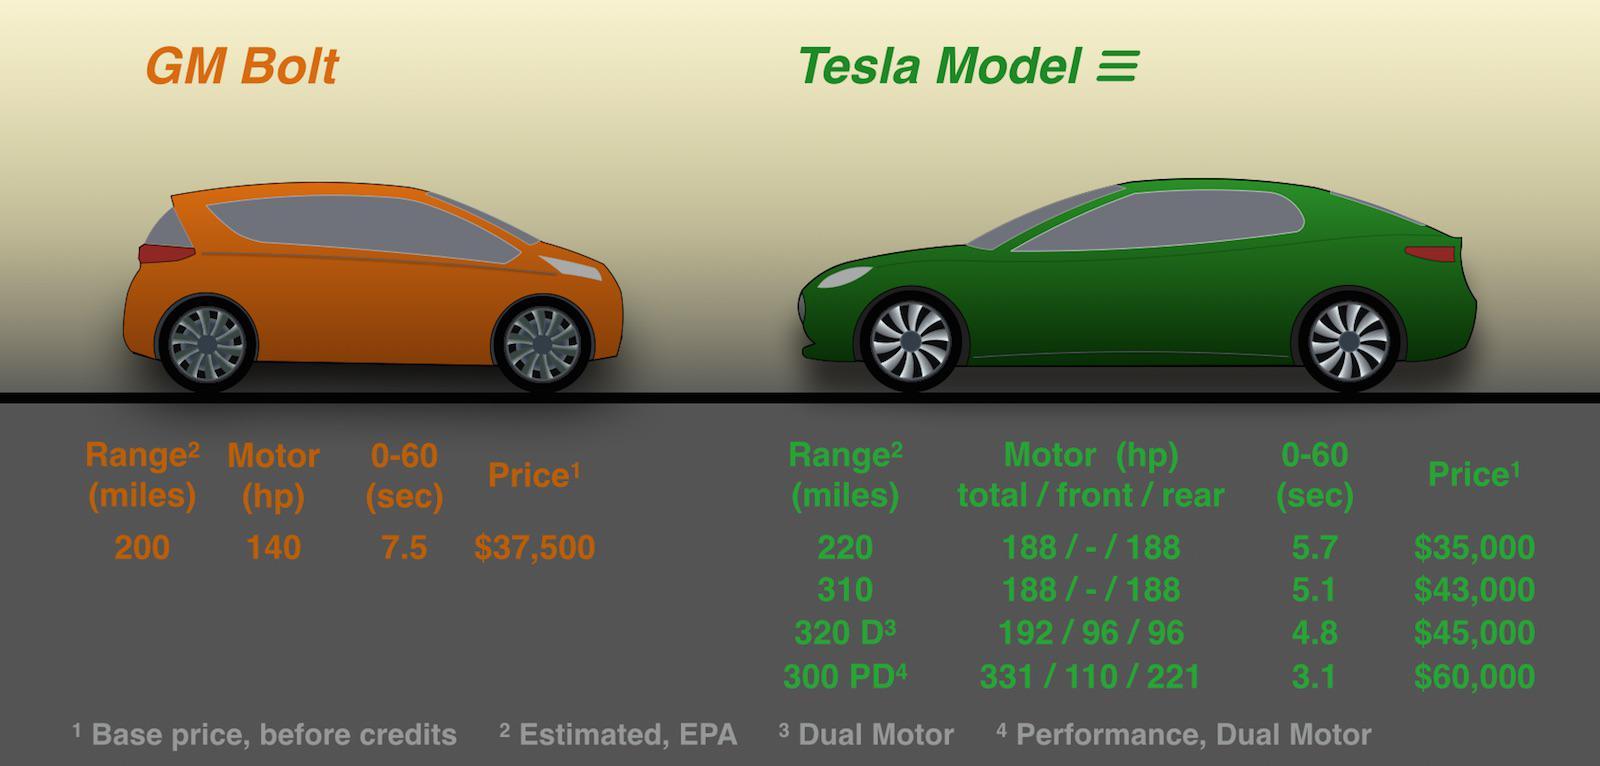 Gm Bolt Compared To Tesla Model 3